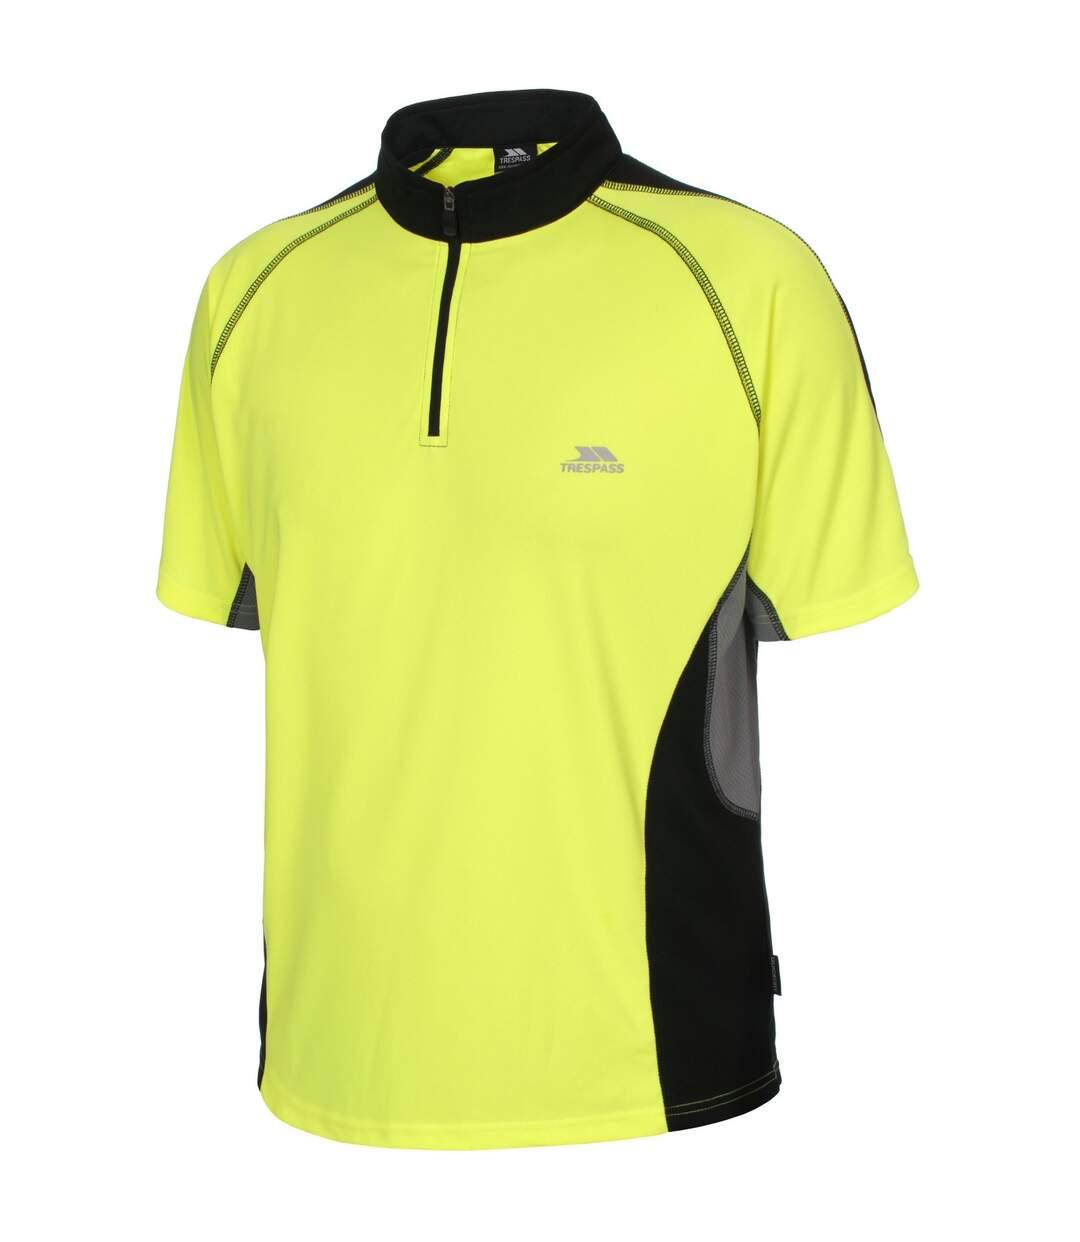 Trespass Mens Grenada Short Sleeve Zip Neck Athletic T-Shirt (Hi Vis Yellow) - UTTP336